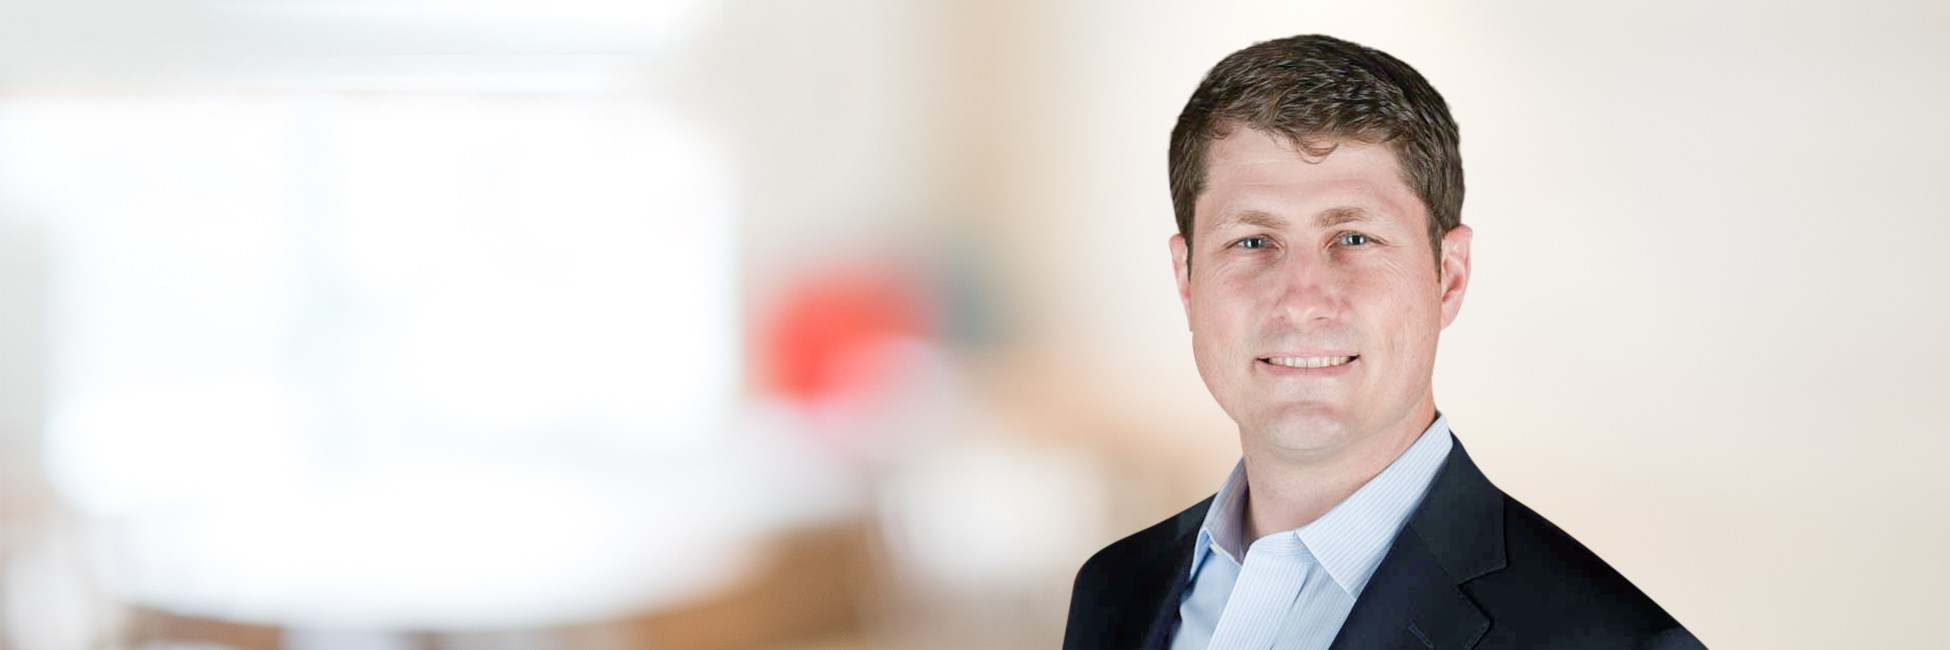 David Mortlock — Management Consultant - Bain & Company